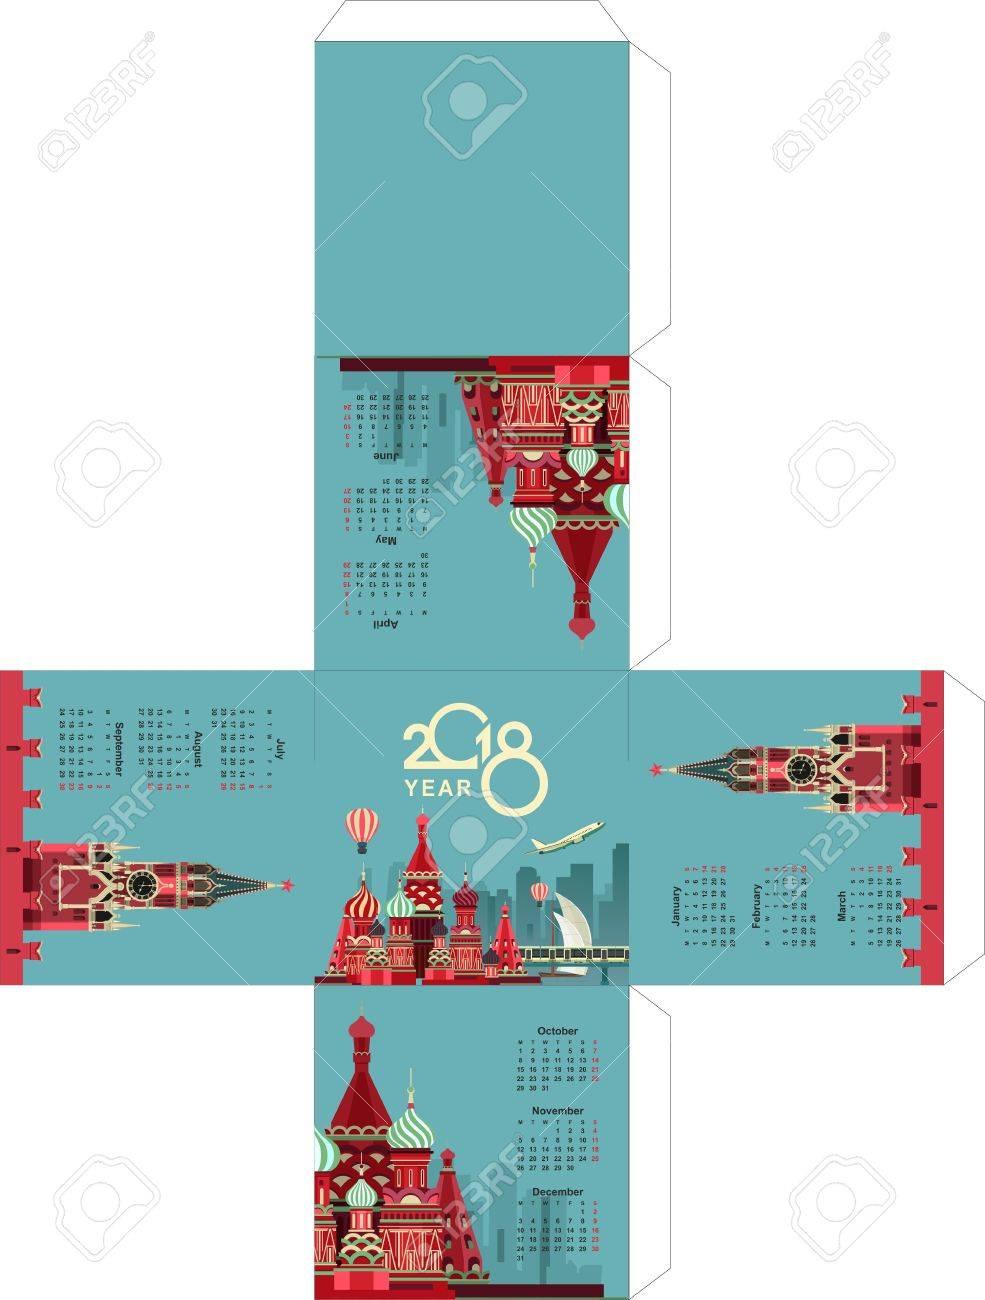 Vector Illustration Template For Gluing A Desktop Office Calendar